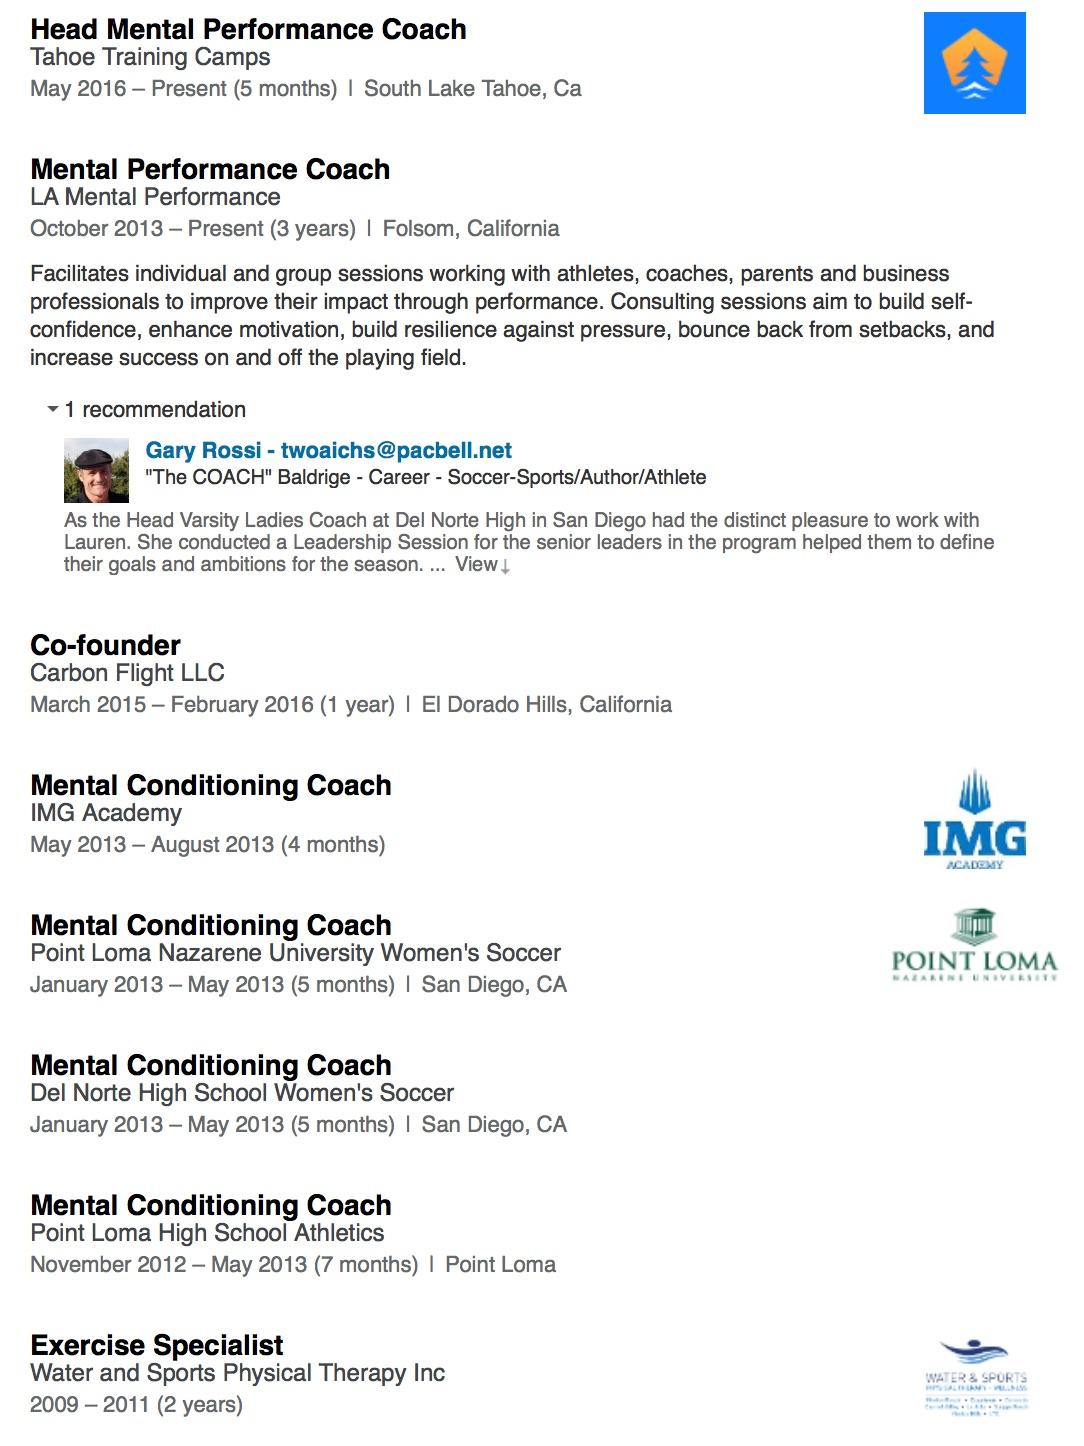 - Click here to visit Lauren's LinkedIn profile.